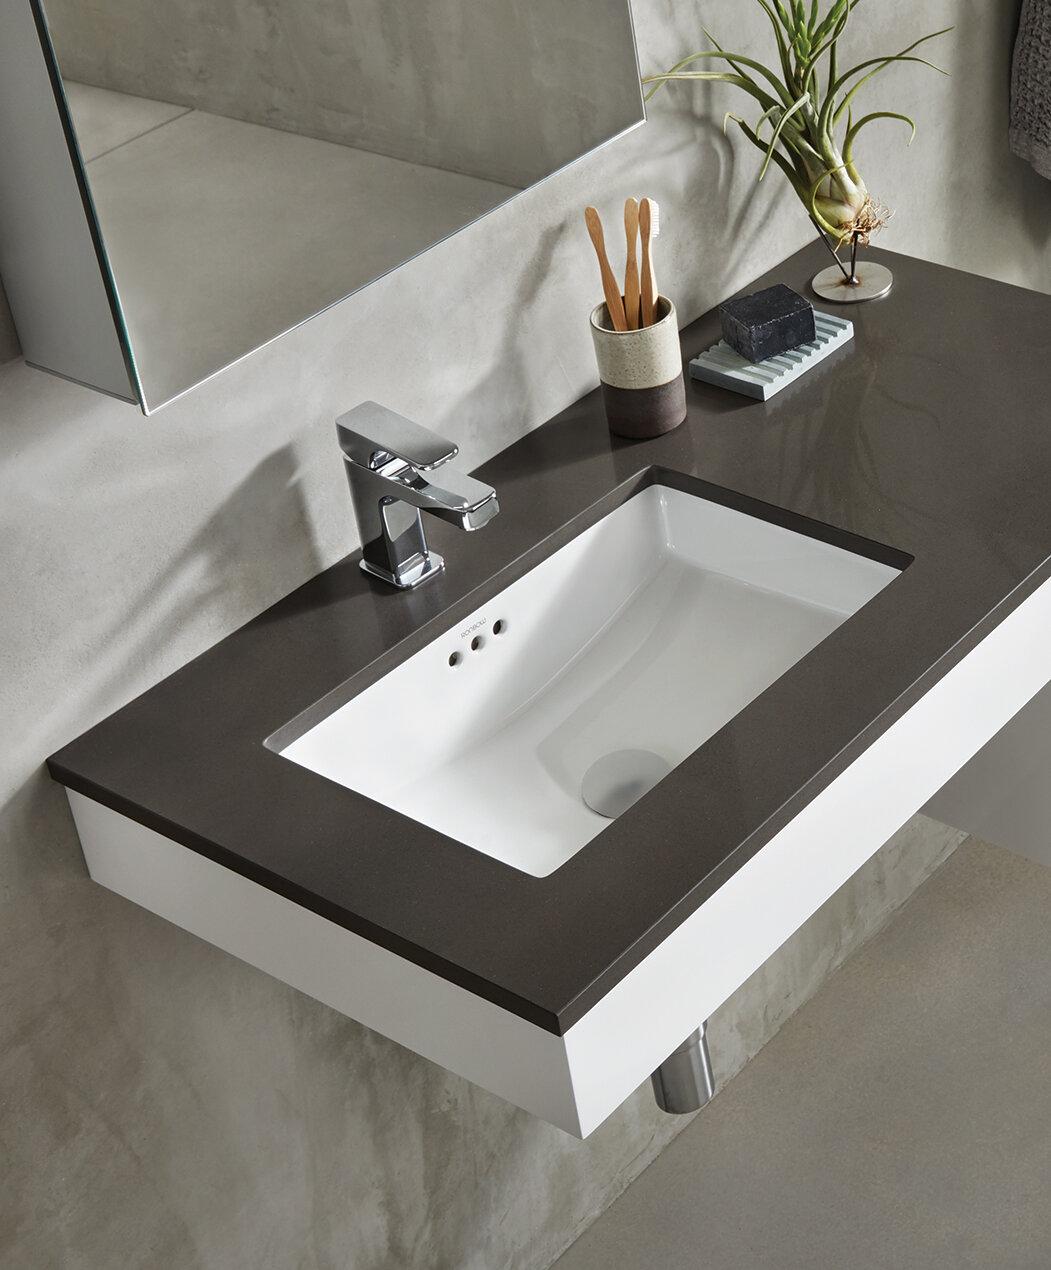 Ronbow Essence Ceramic Rectangular Undermount Bathroom Sink with Overflow & Reviews | Wayfair